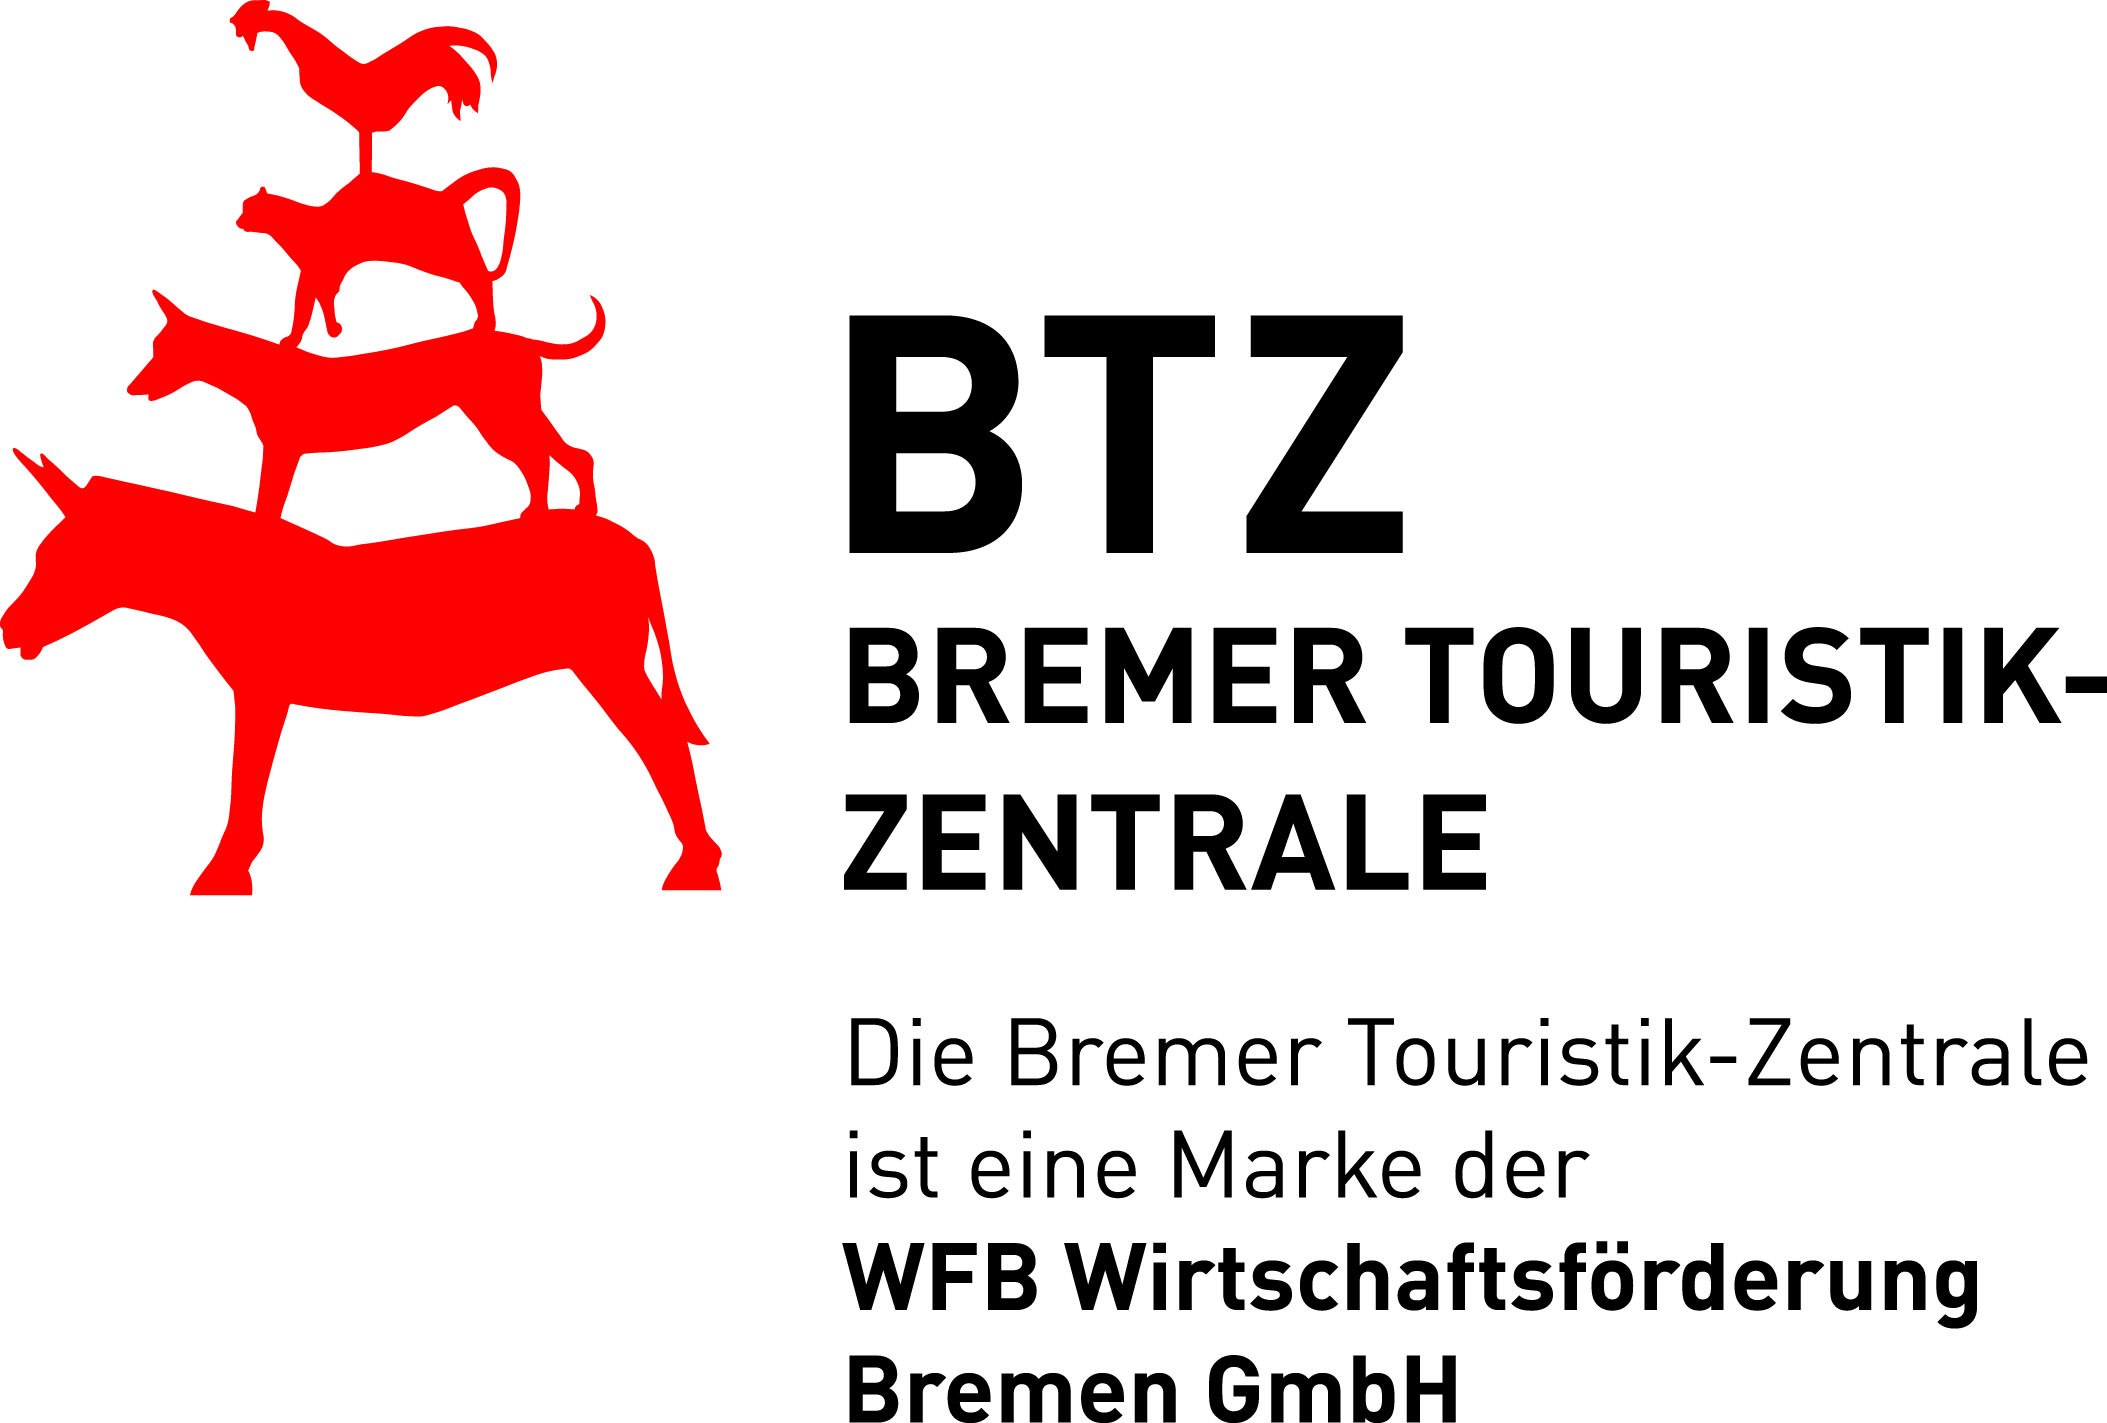 www.bremen-tourismus.de/